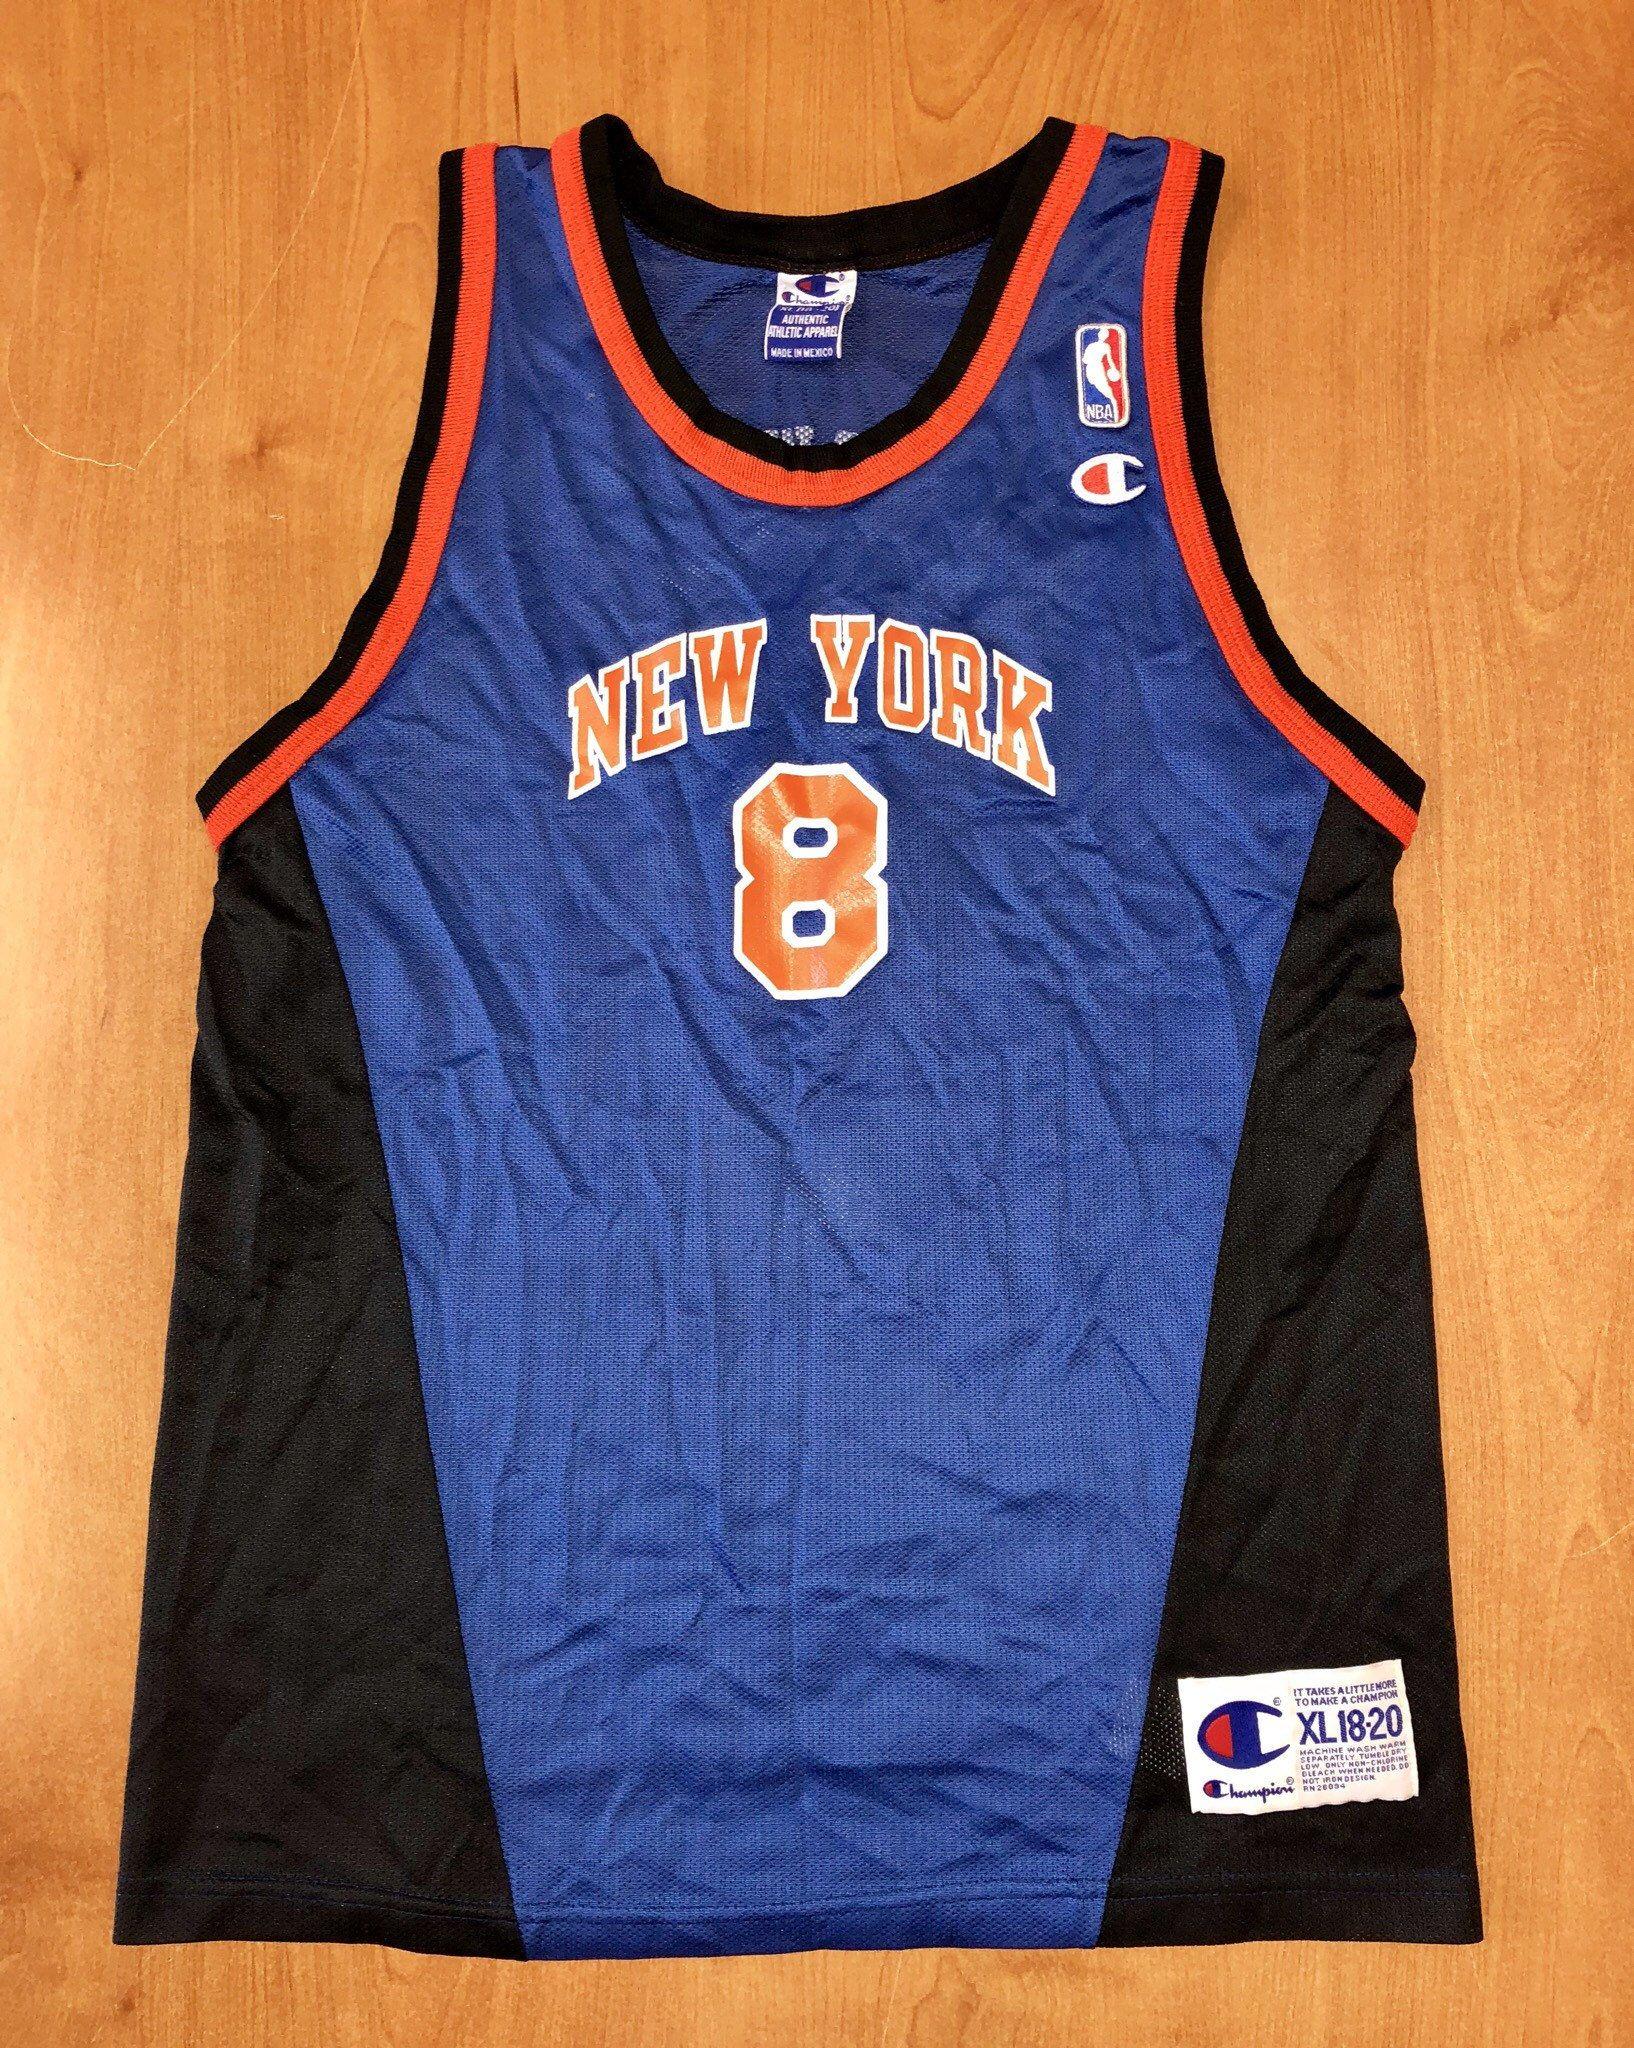 57509f6e751 Vintage 1998 Latrell Sprewell New York Knicks Champion Jersey Size Youth XL  kids shirt charles oakley nba finals penny hardaway alabama tide by ...